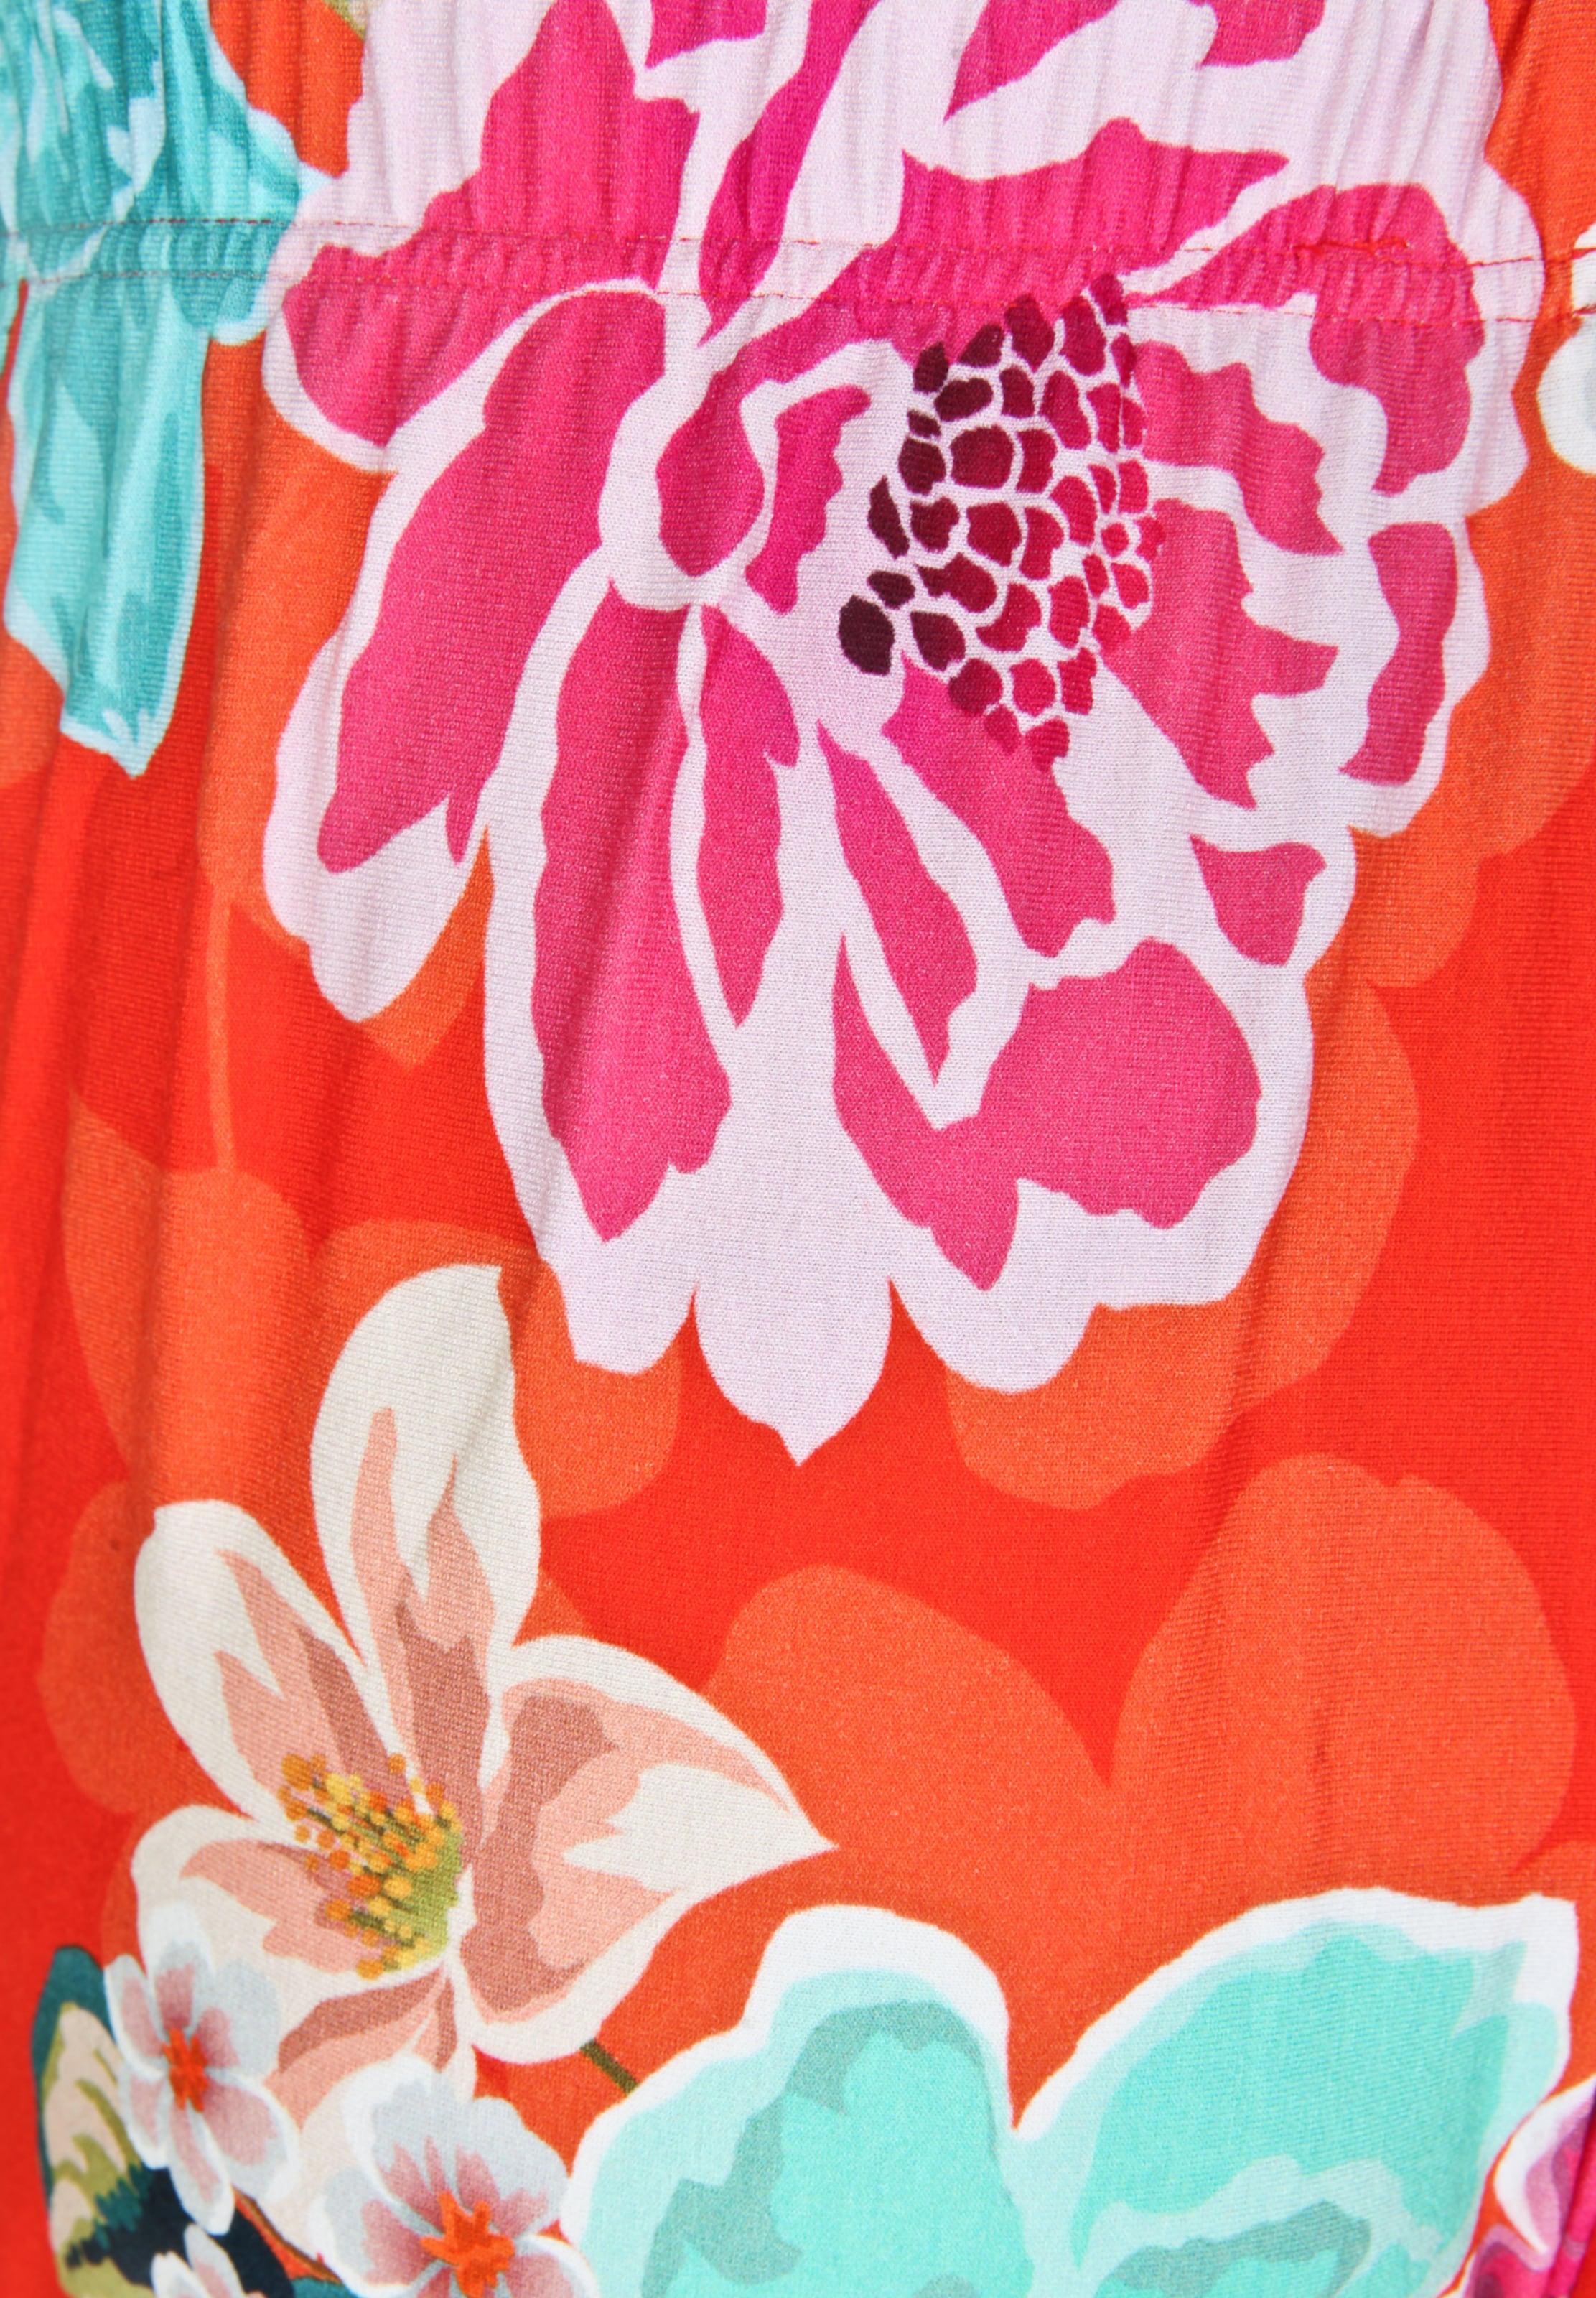 Blumenmuster Seeyou Hose Rot In Mit Y7fyvb6g